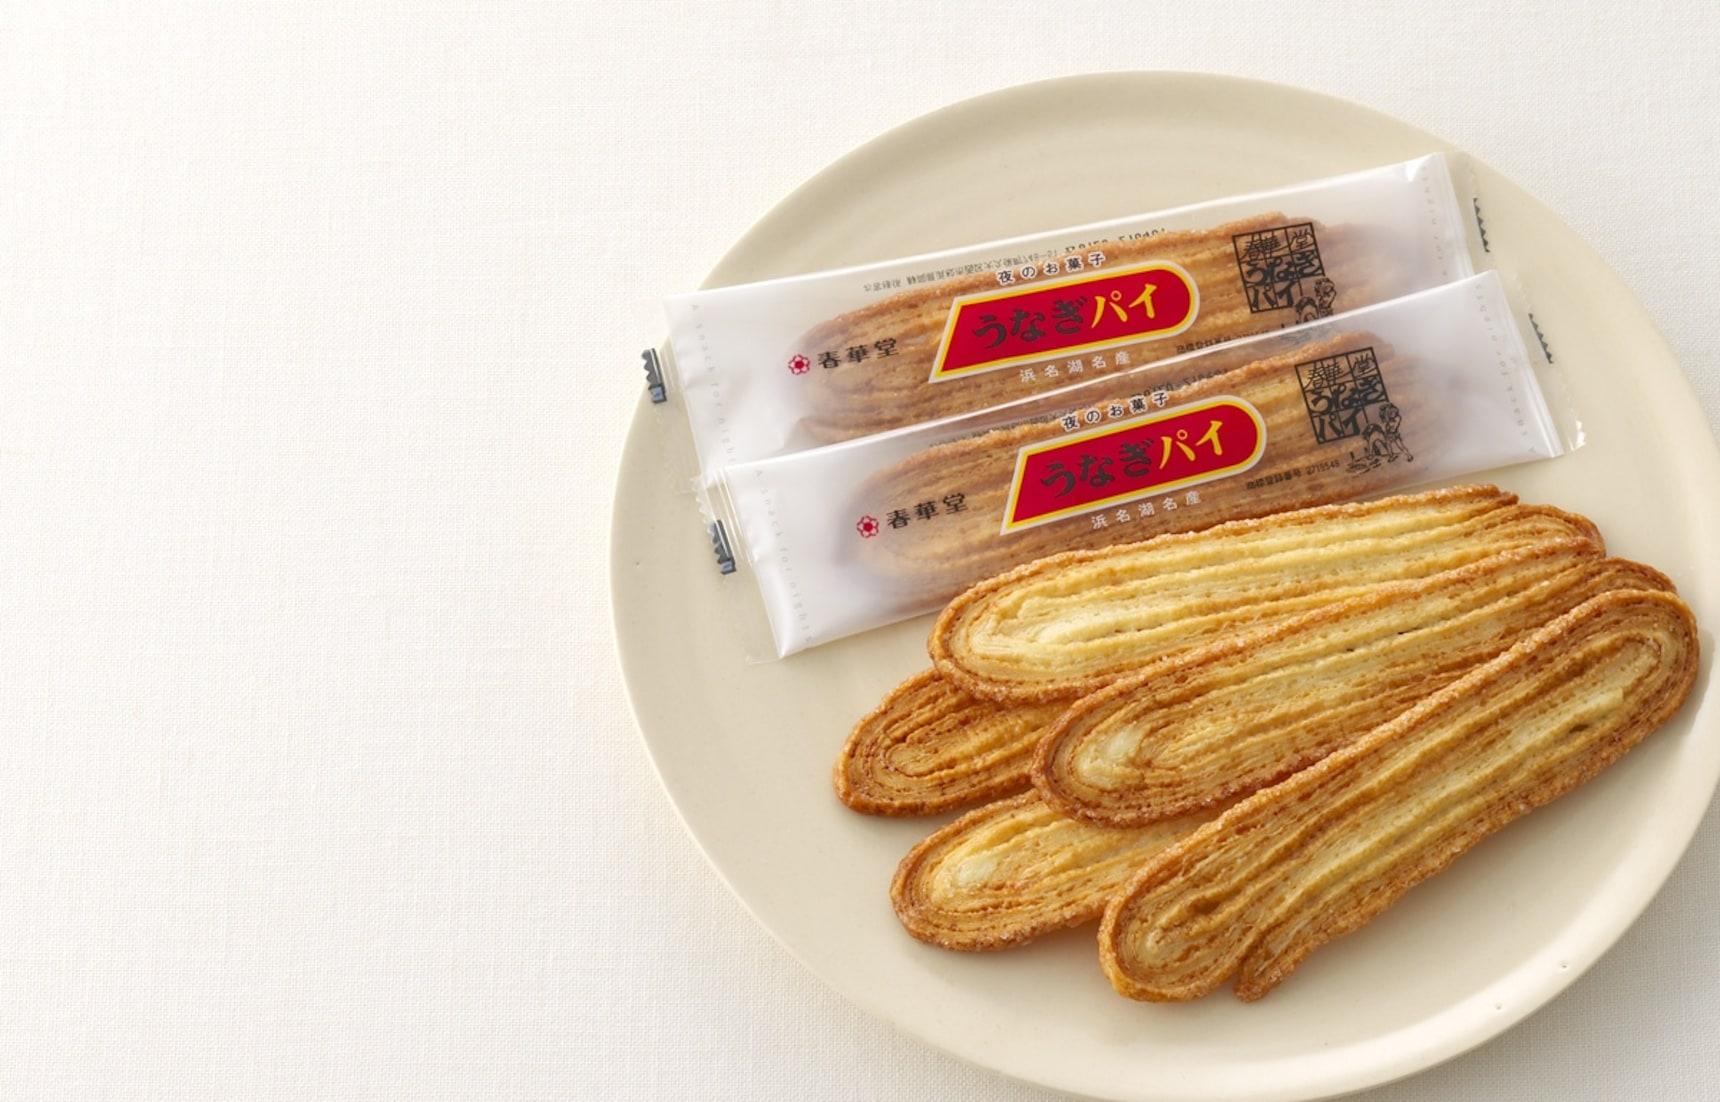 Shunkado: 130 Years of Sweets